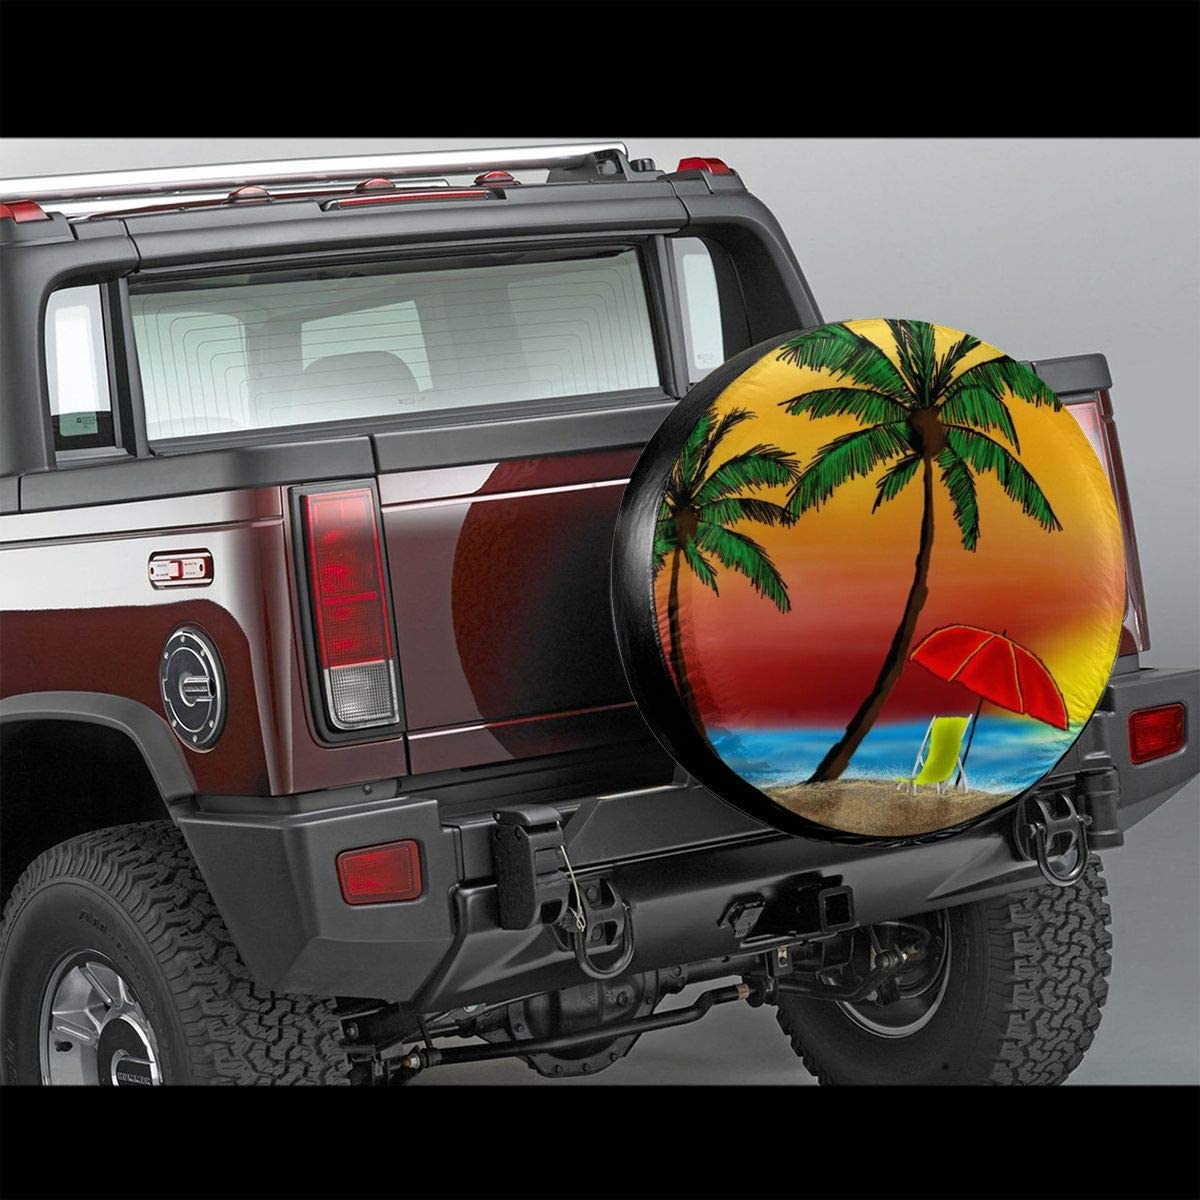 SUV 14,15,16,17 Inch SHOE GONE Car Tire Cover Beach Spare Wheel Tire Cover for Trailer RV Truck Wheel,Camper Travel Trailer Accessories